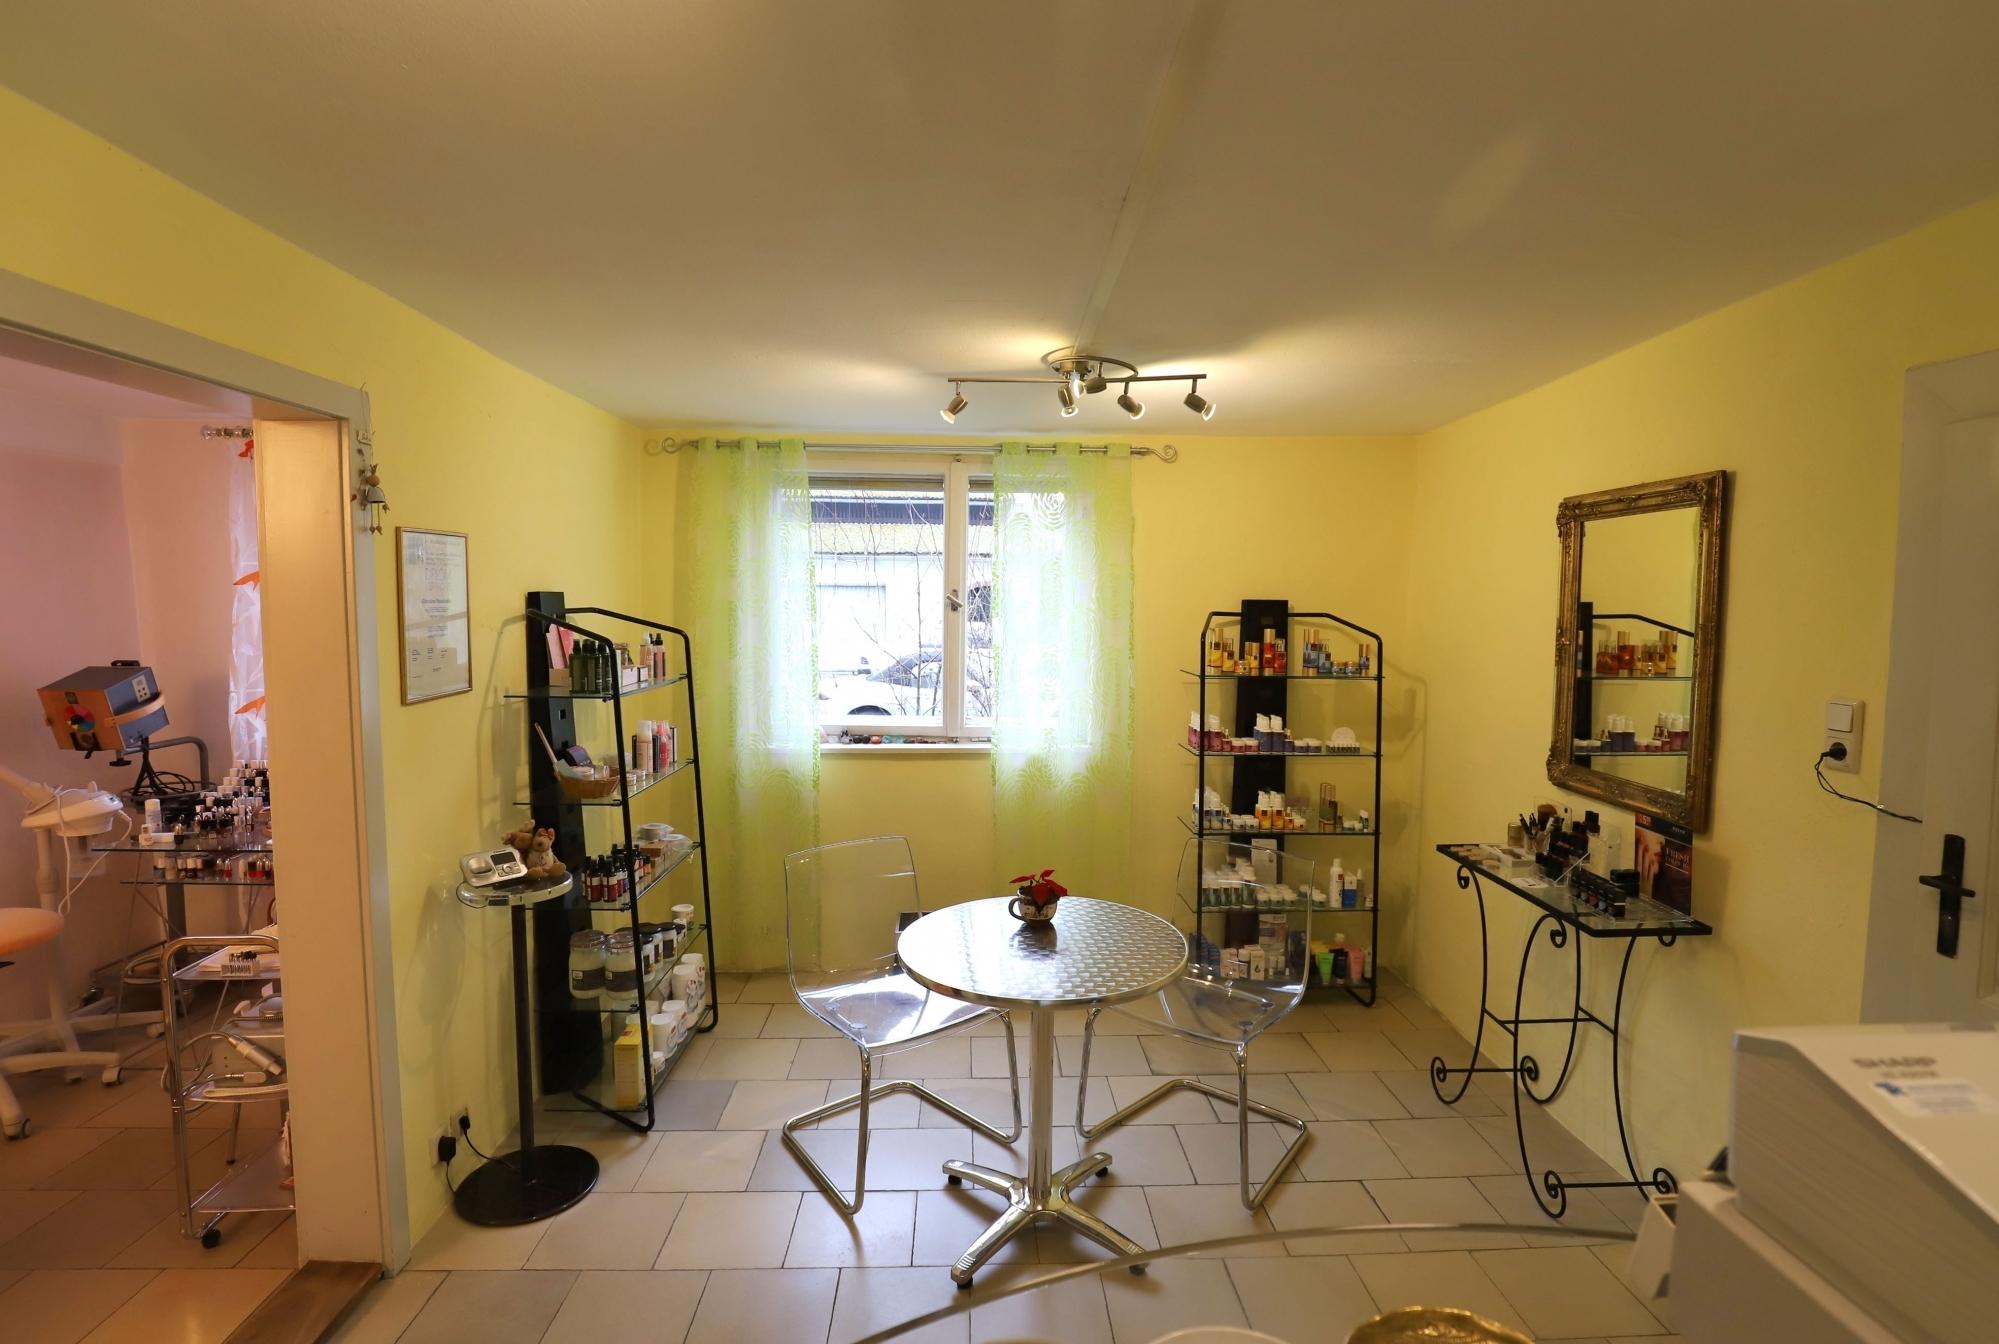 Kosmetikstudio im Erdgeschoss